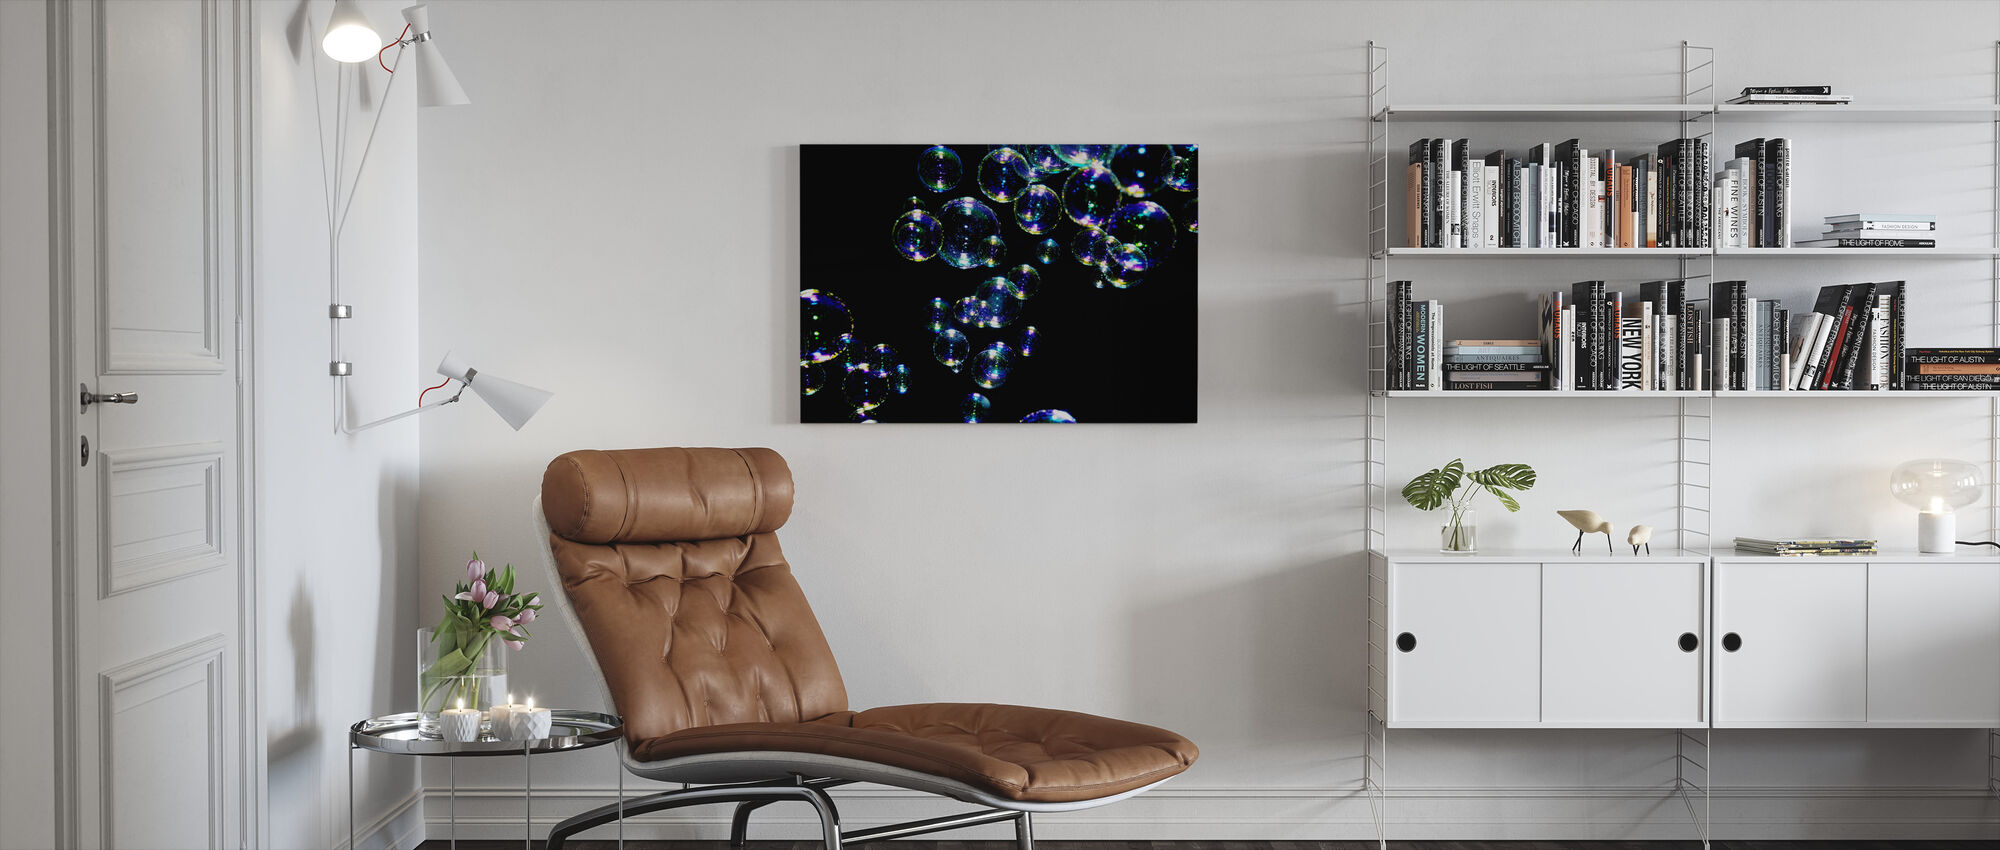 Glistening Bubbles - Canvas print - Living Room